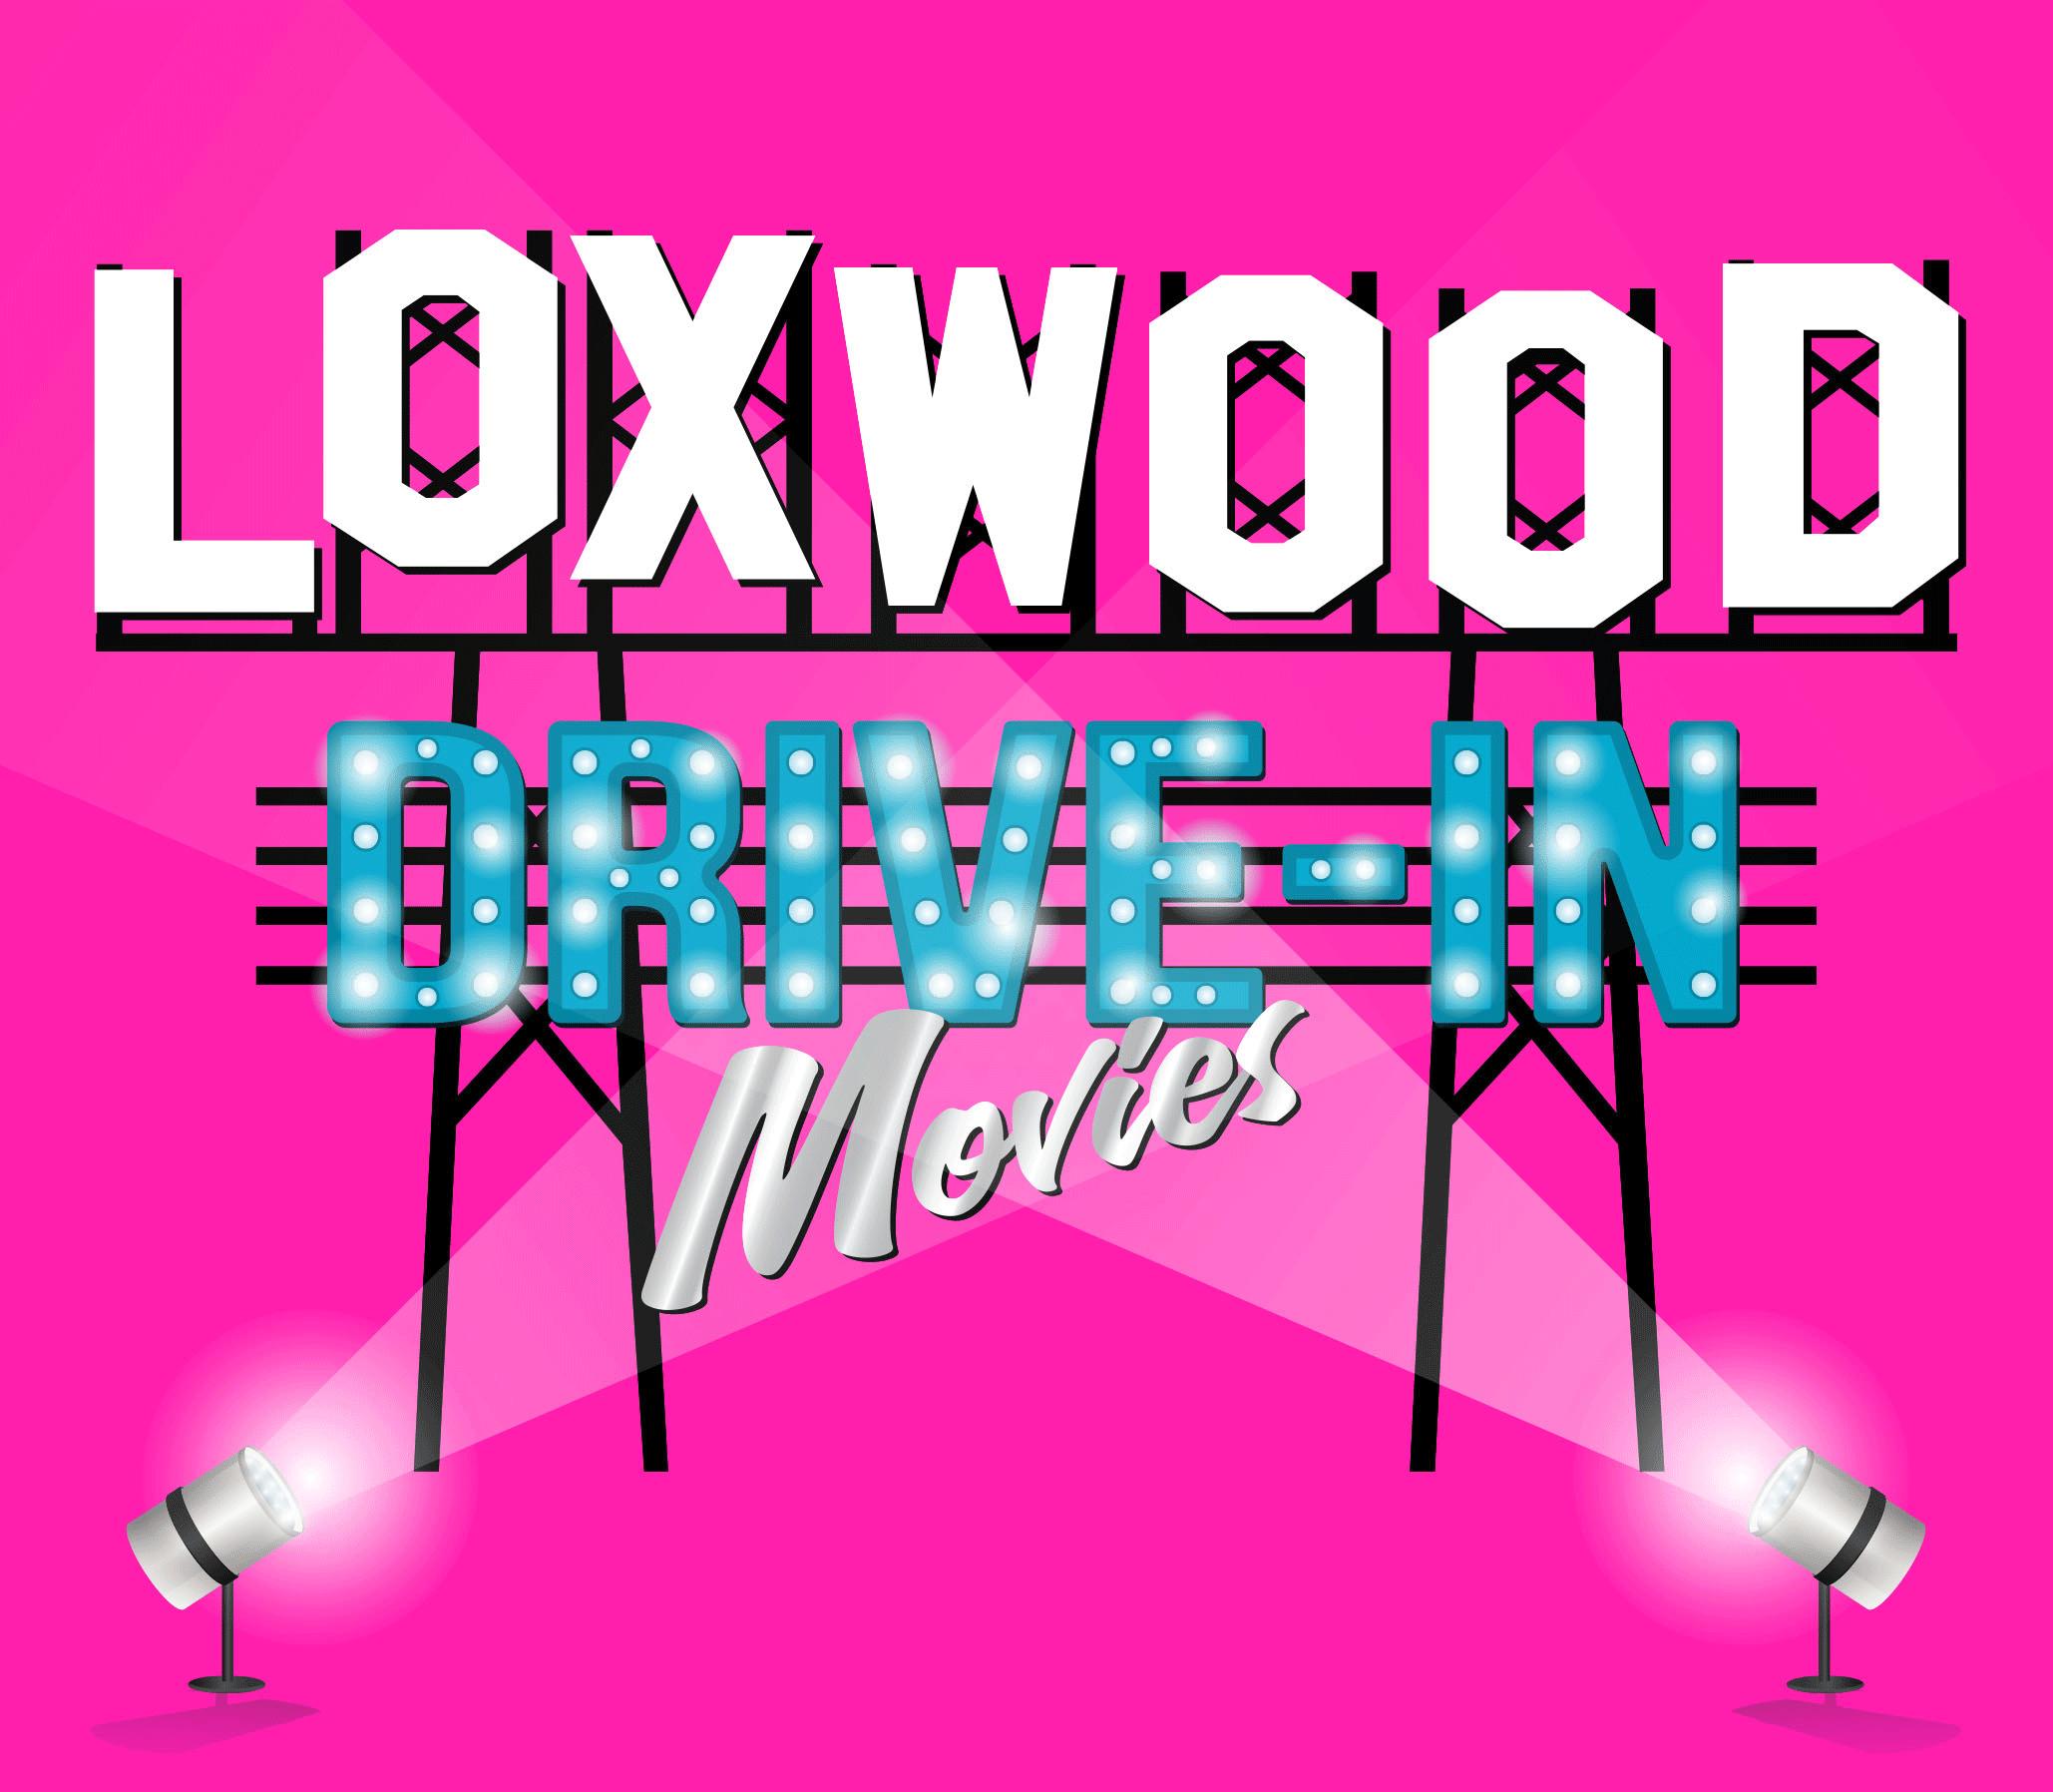 loxwoodmovies